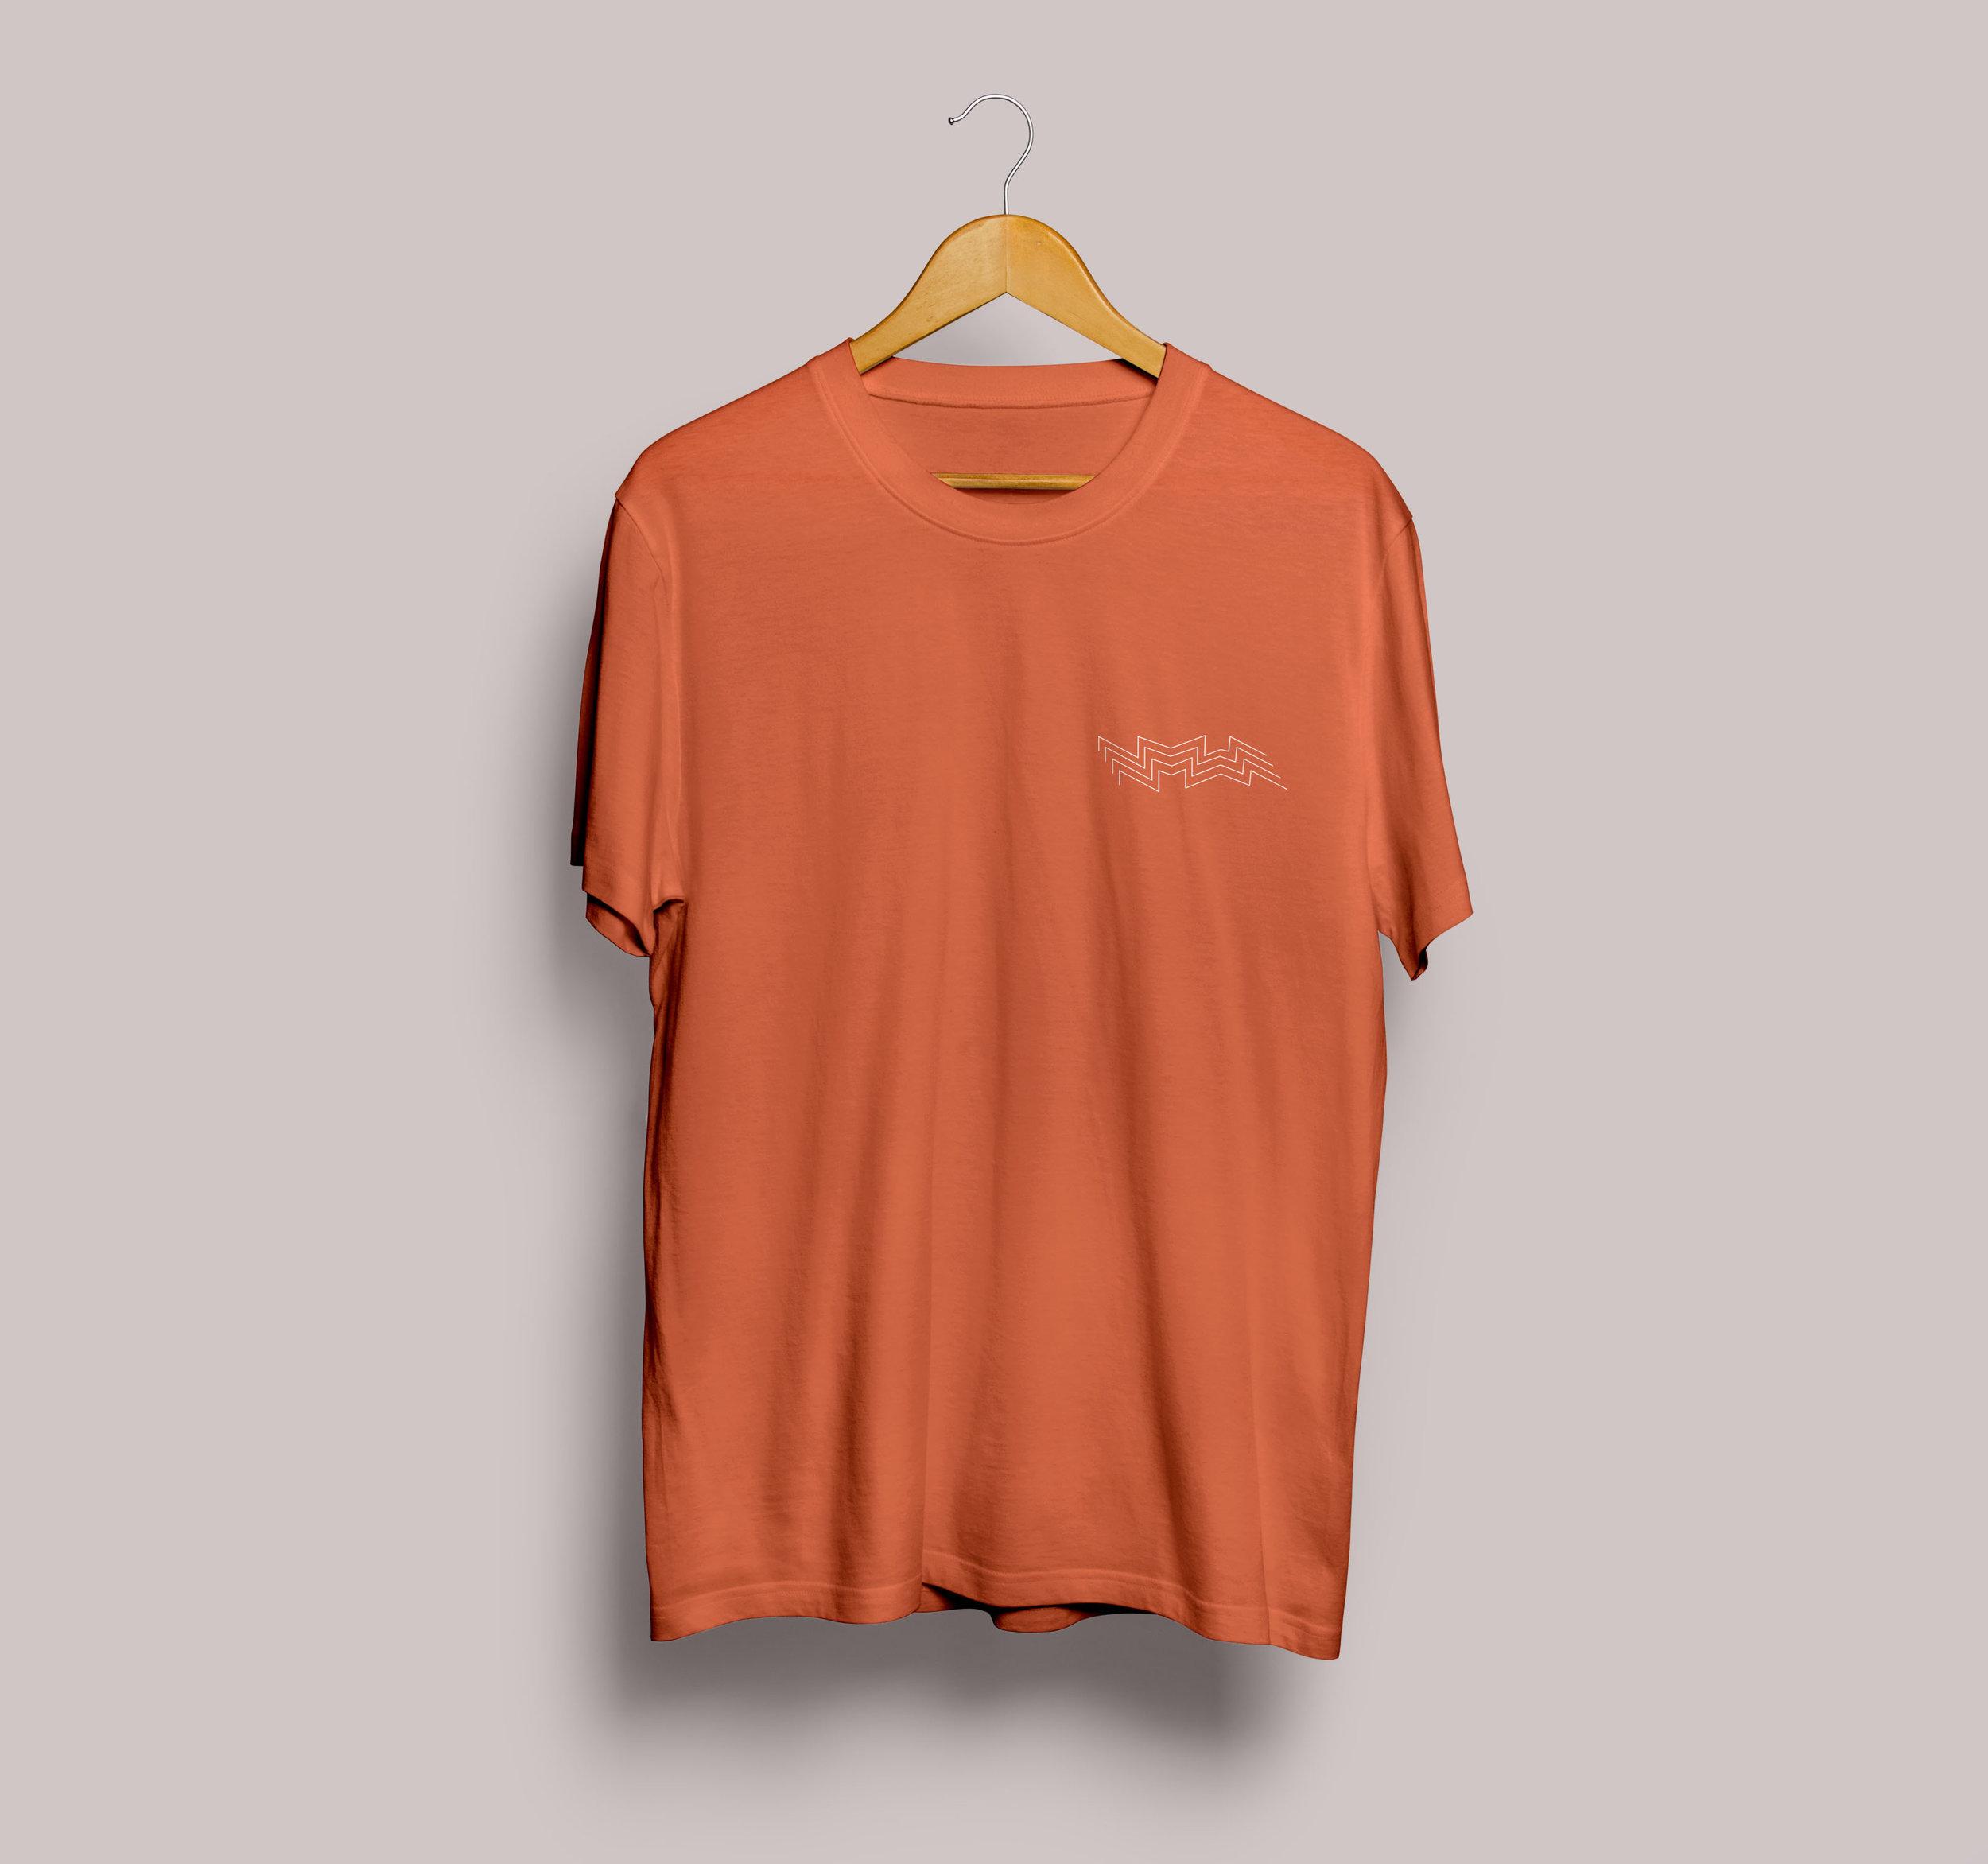 T-Shirt Mock-Up Front2.jpg